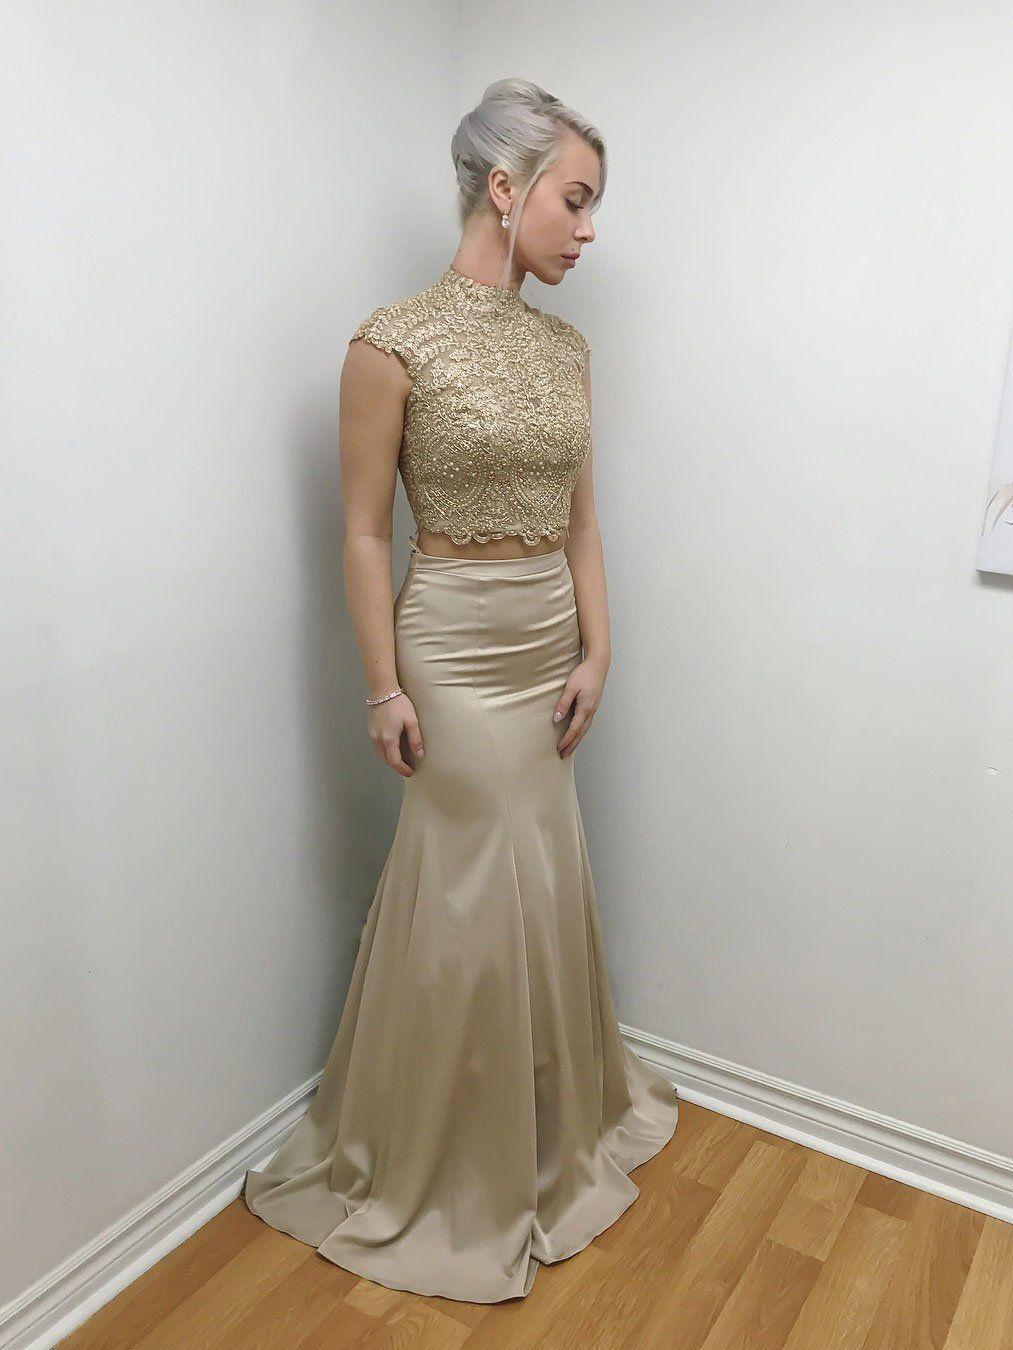 Romantic satin highneck neckline pieces mermaid prom dresses with